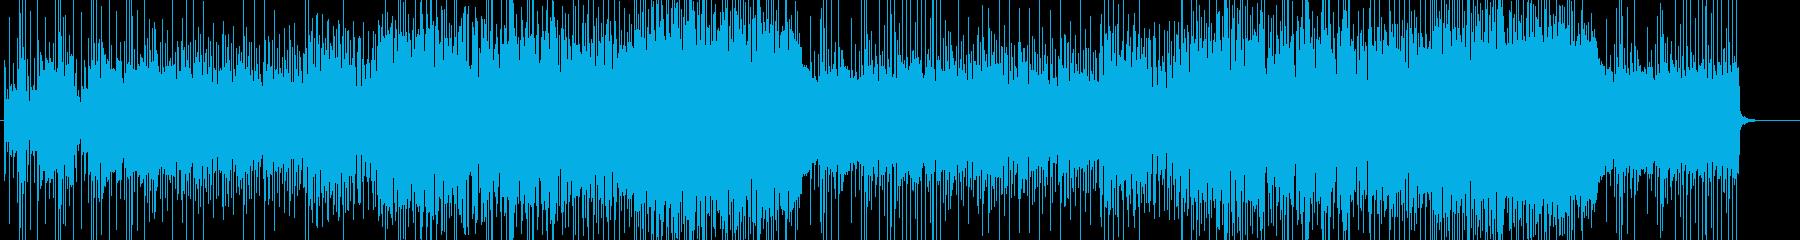 「HR/HM」「DARK」BGM154の再生済みの波形